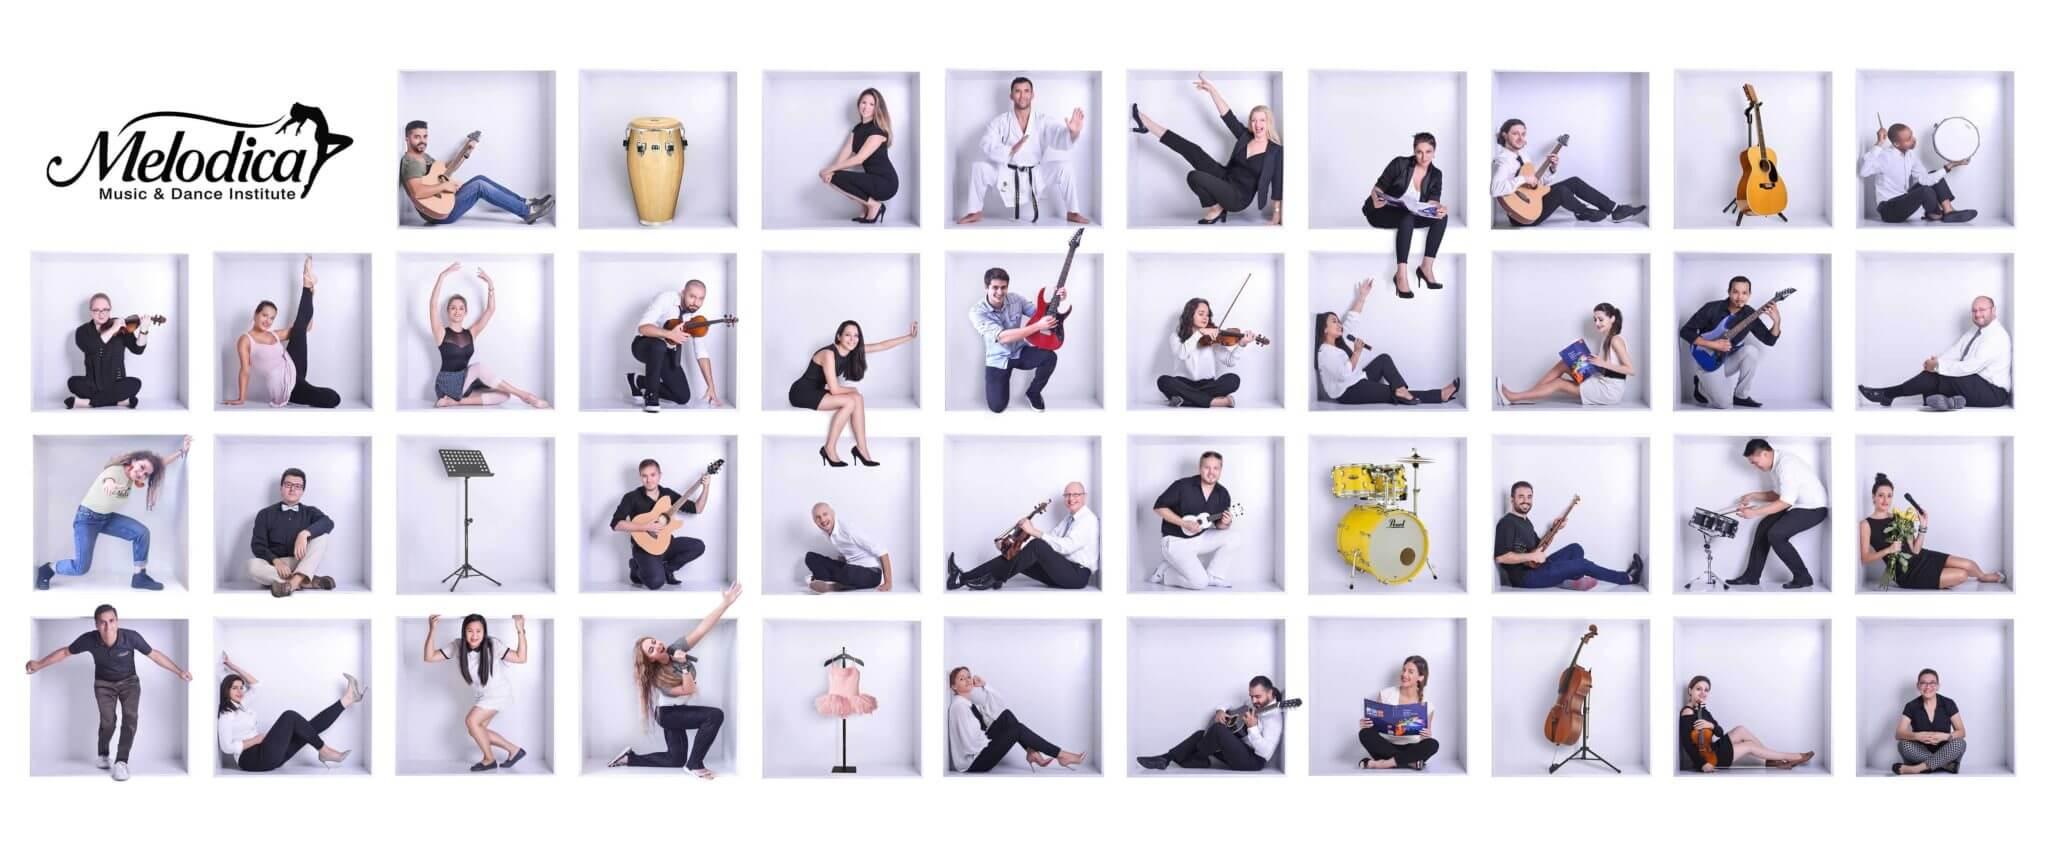 Melodica music school Dubai teachers